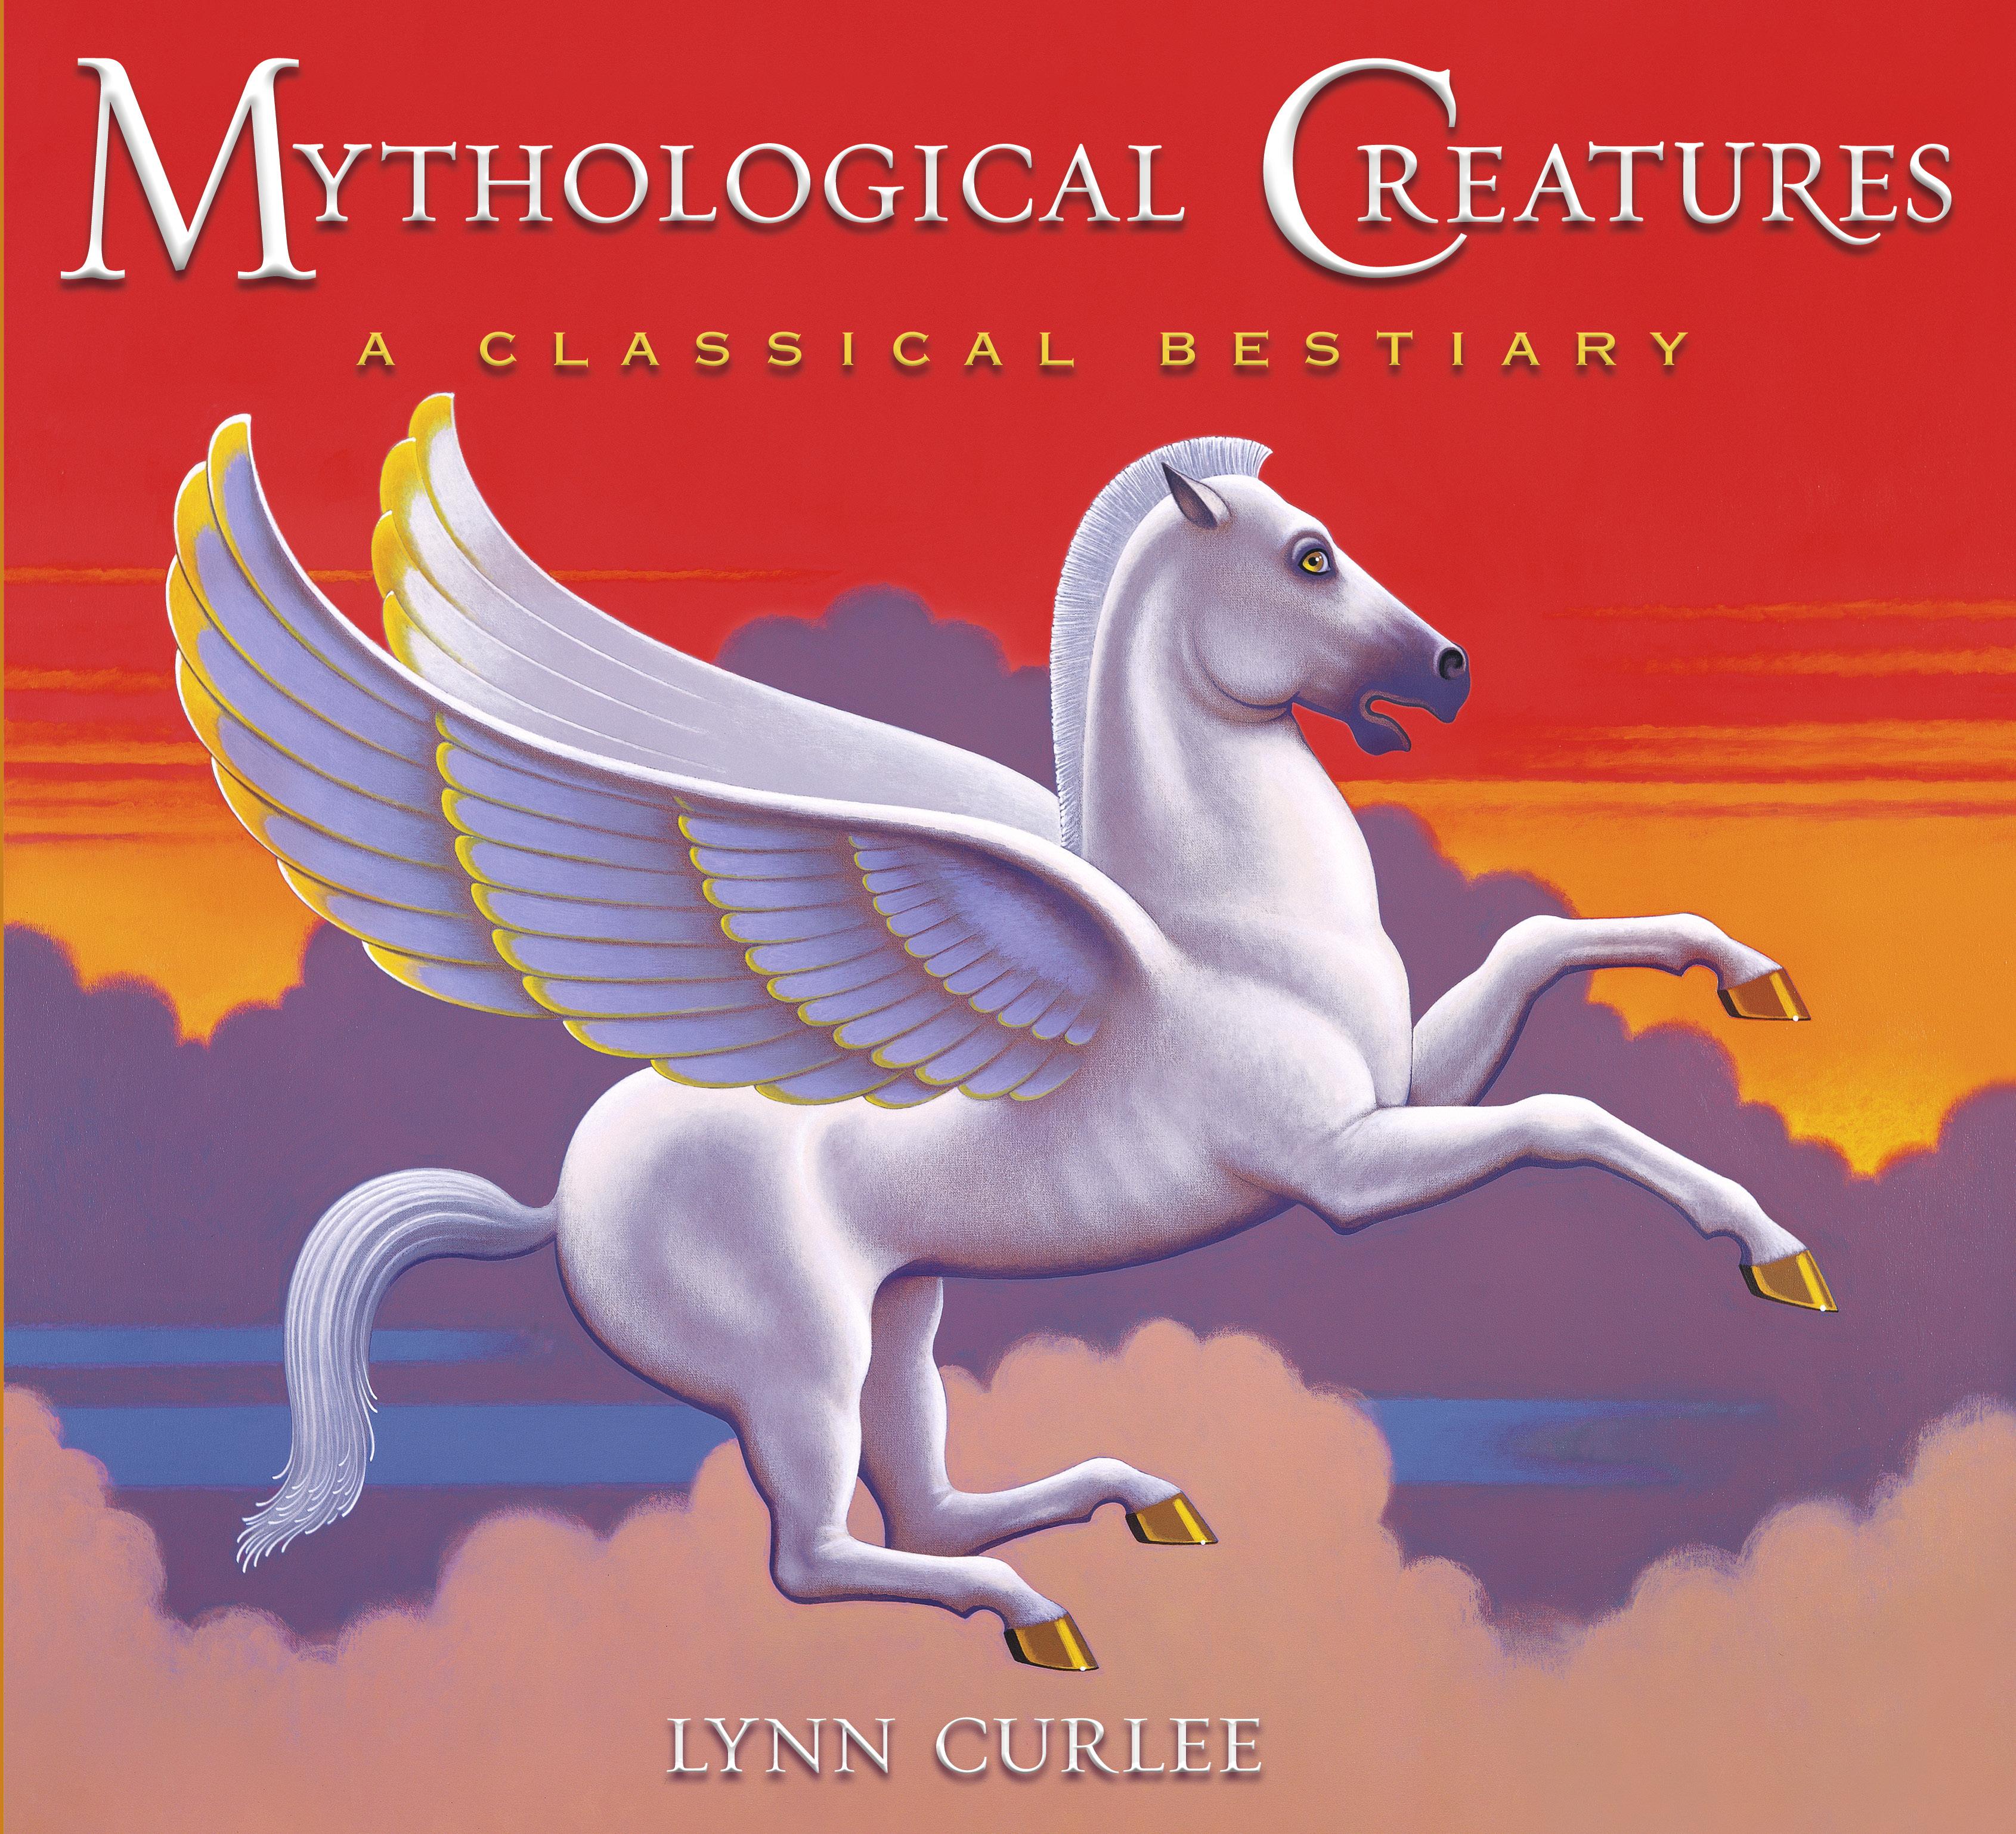 names of mythological creatures